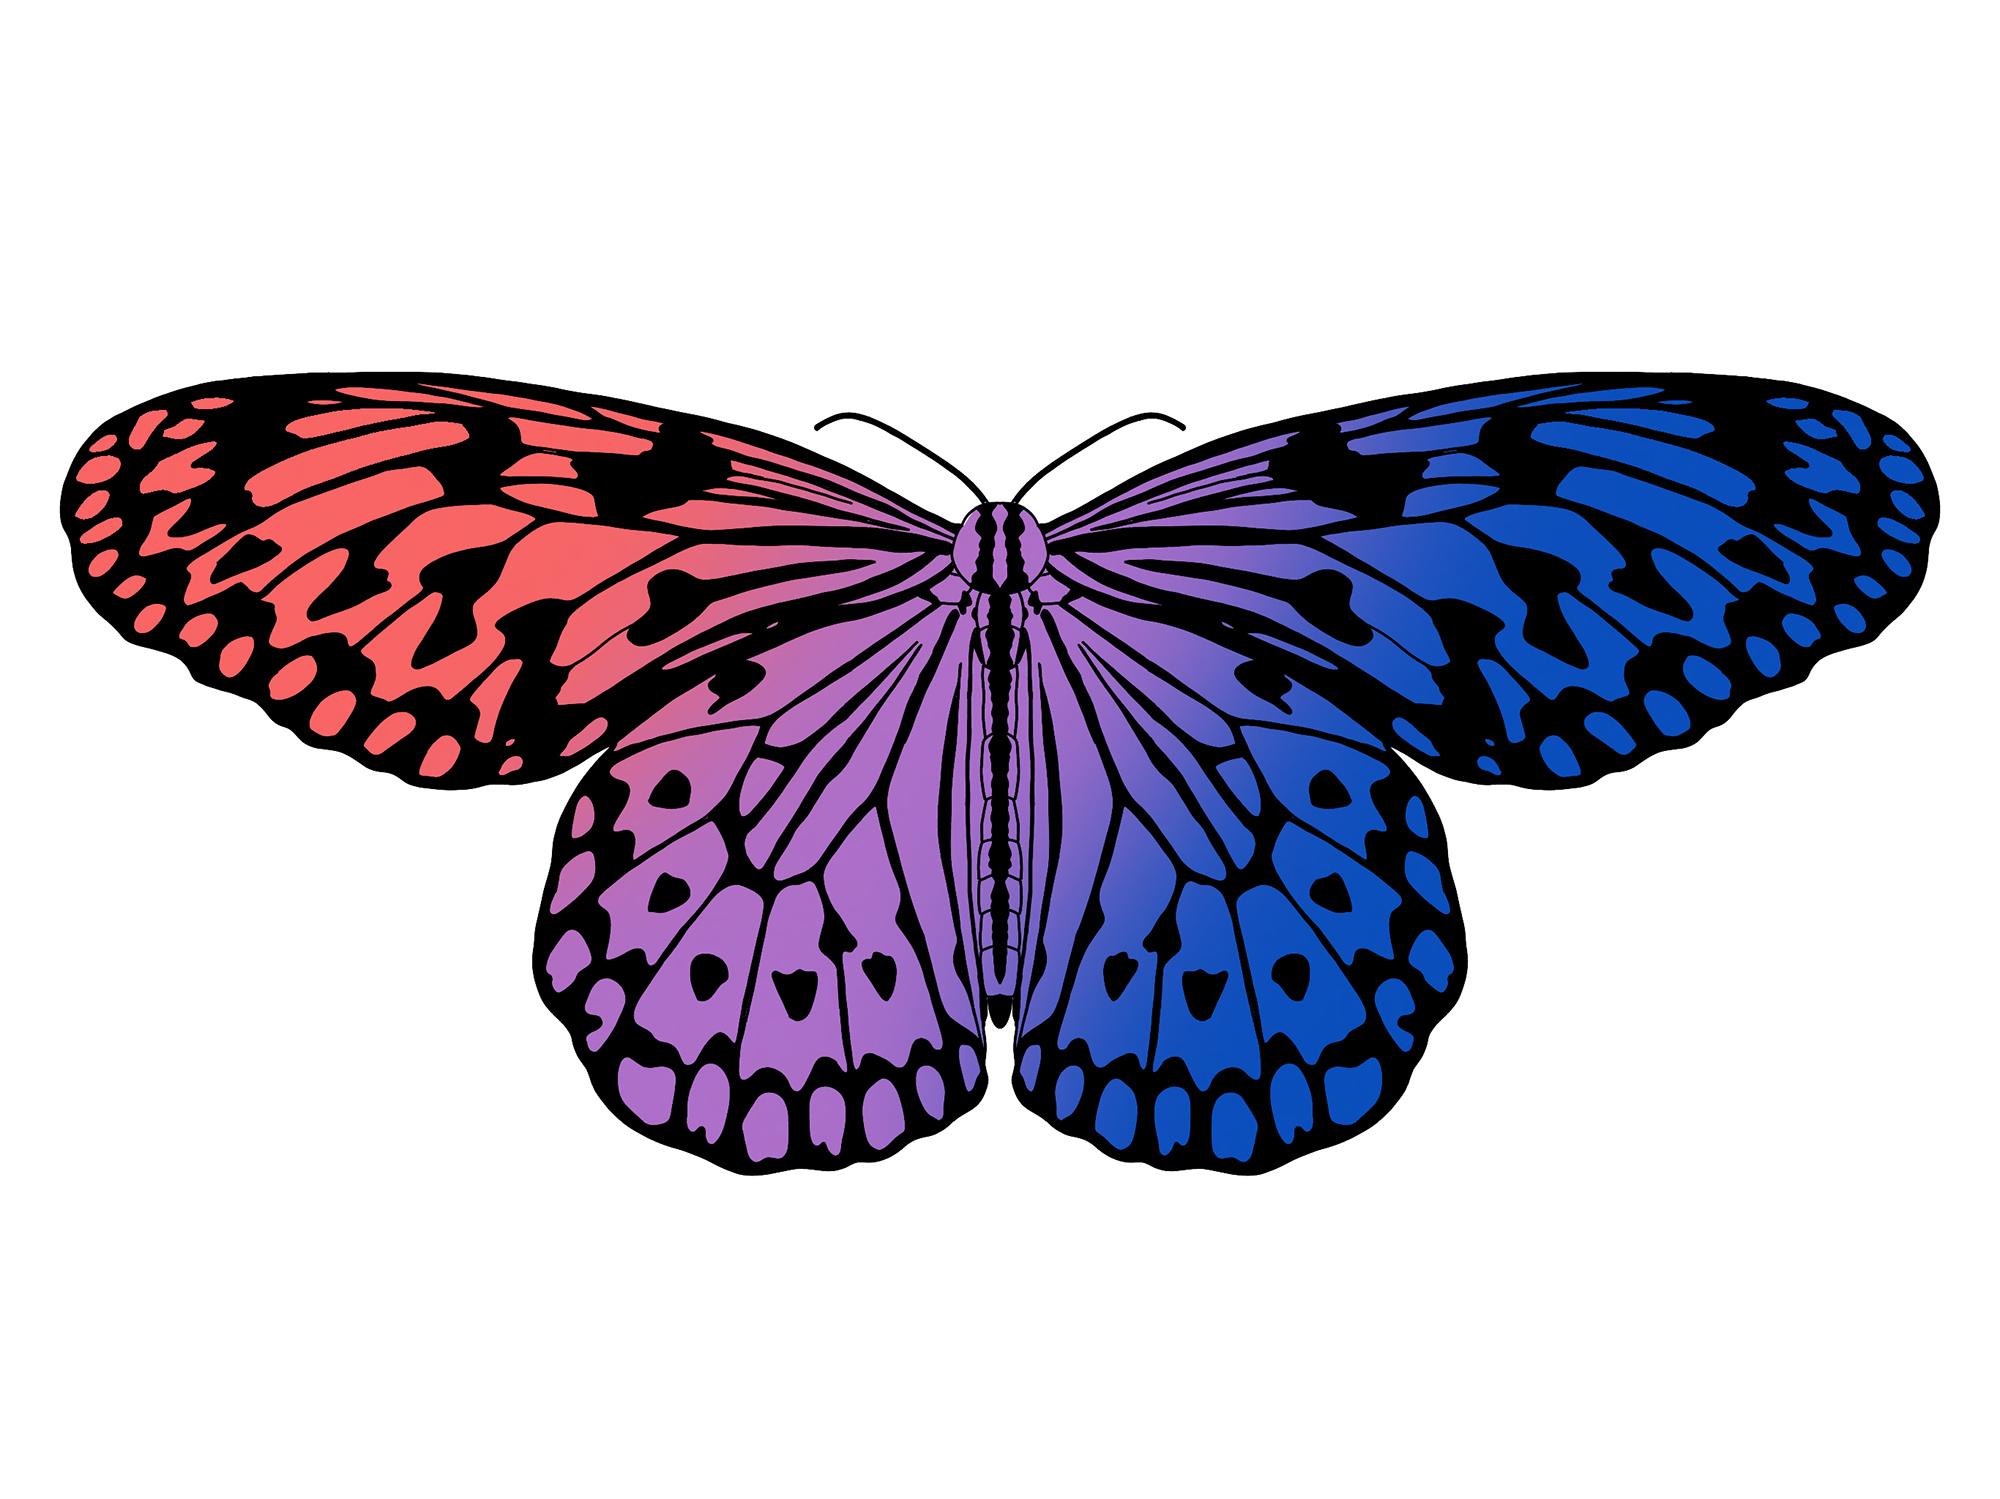 Butterfly Artwork By Kat Sanders